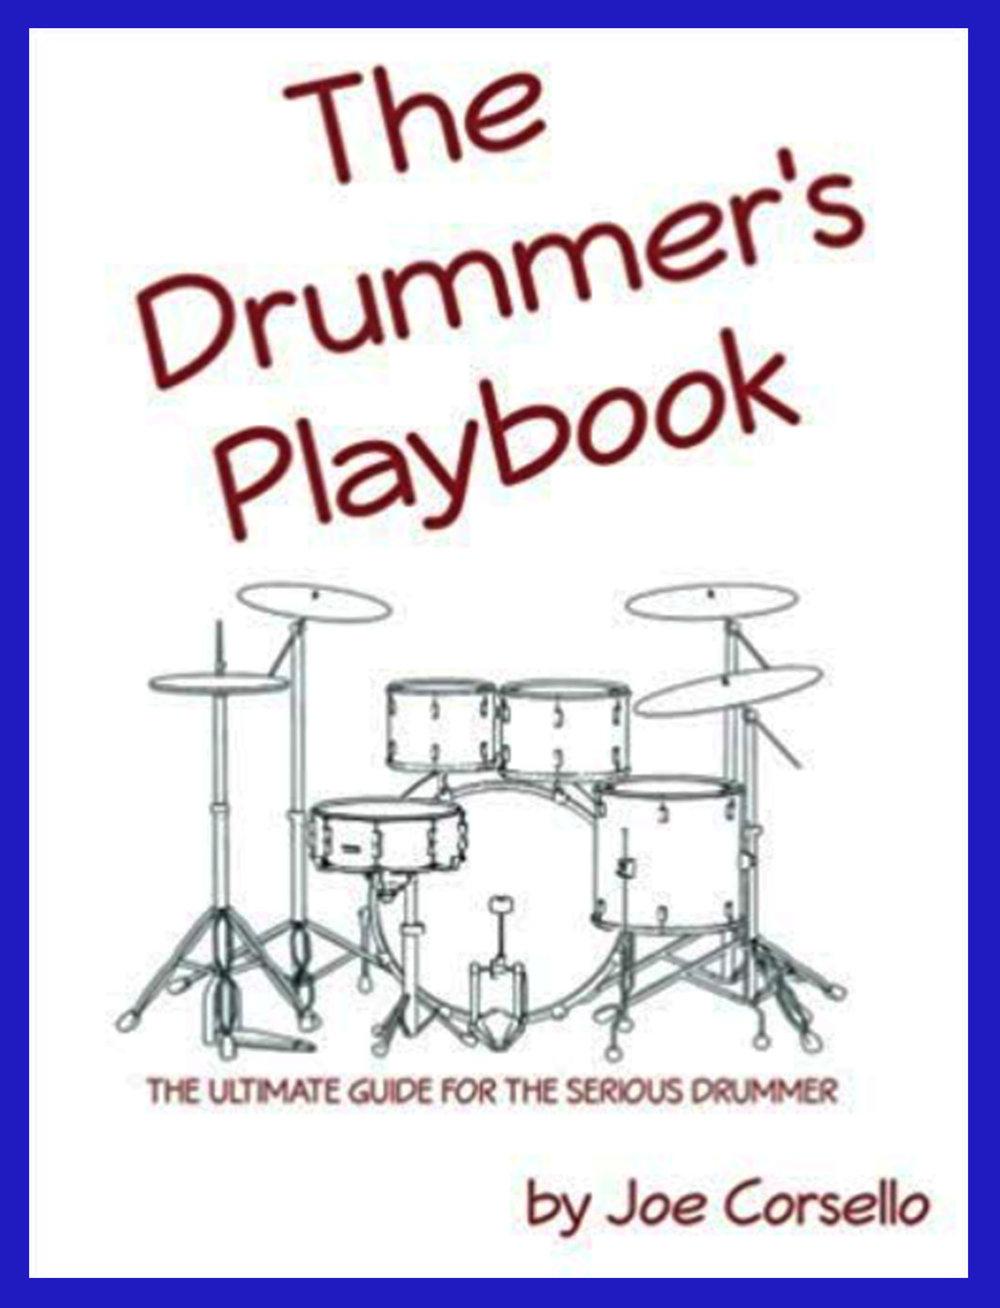 The-Drummer's-Playbook.jpg